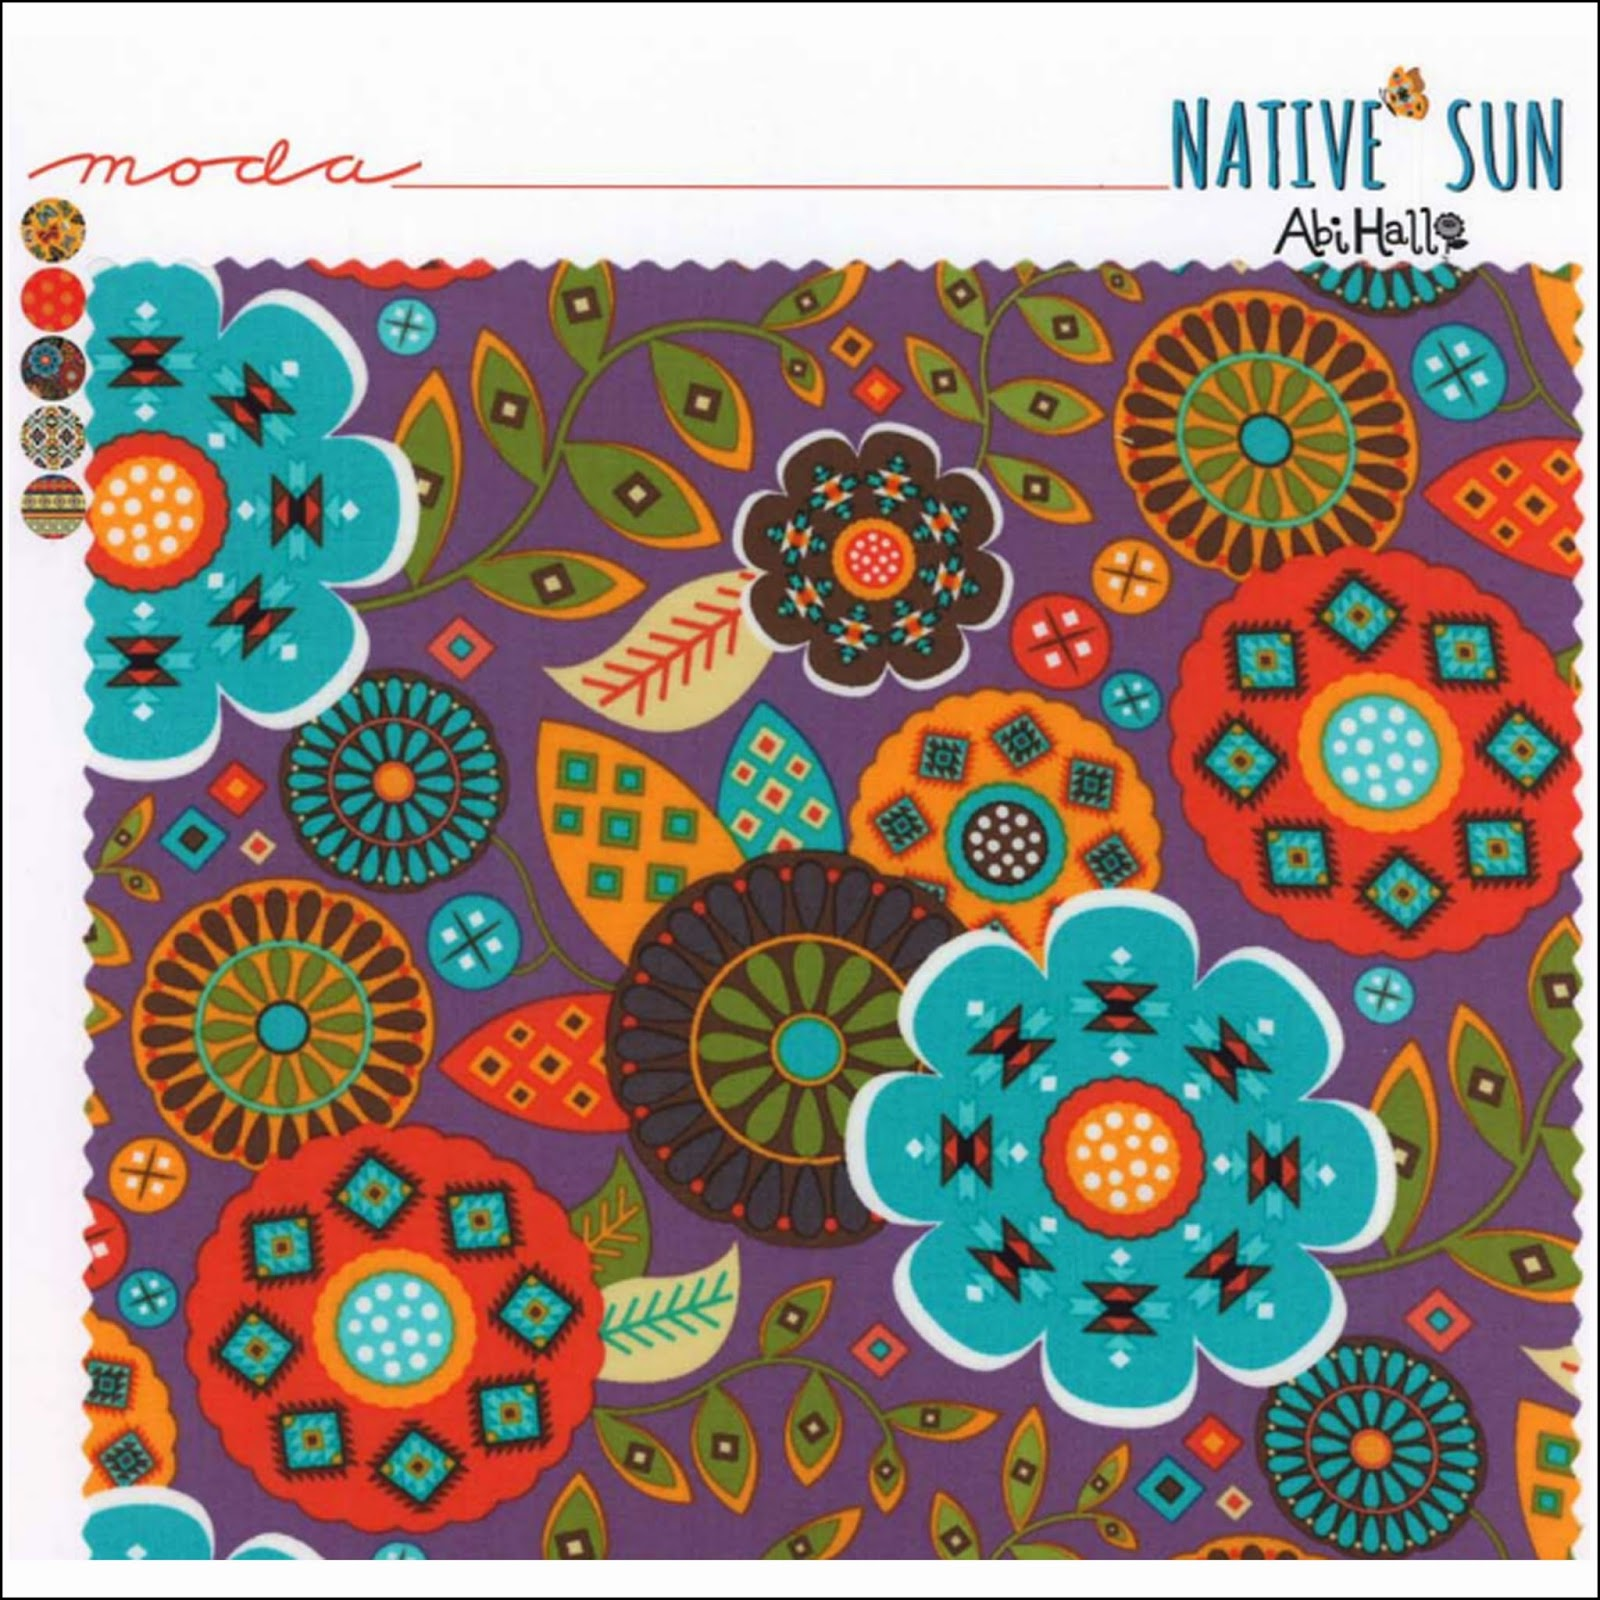 Moda NATIVE SUN Quilt Fabric by Abi Hall for Moda Fabrics